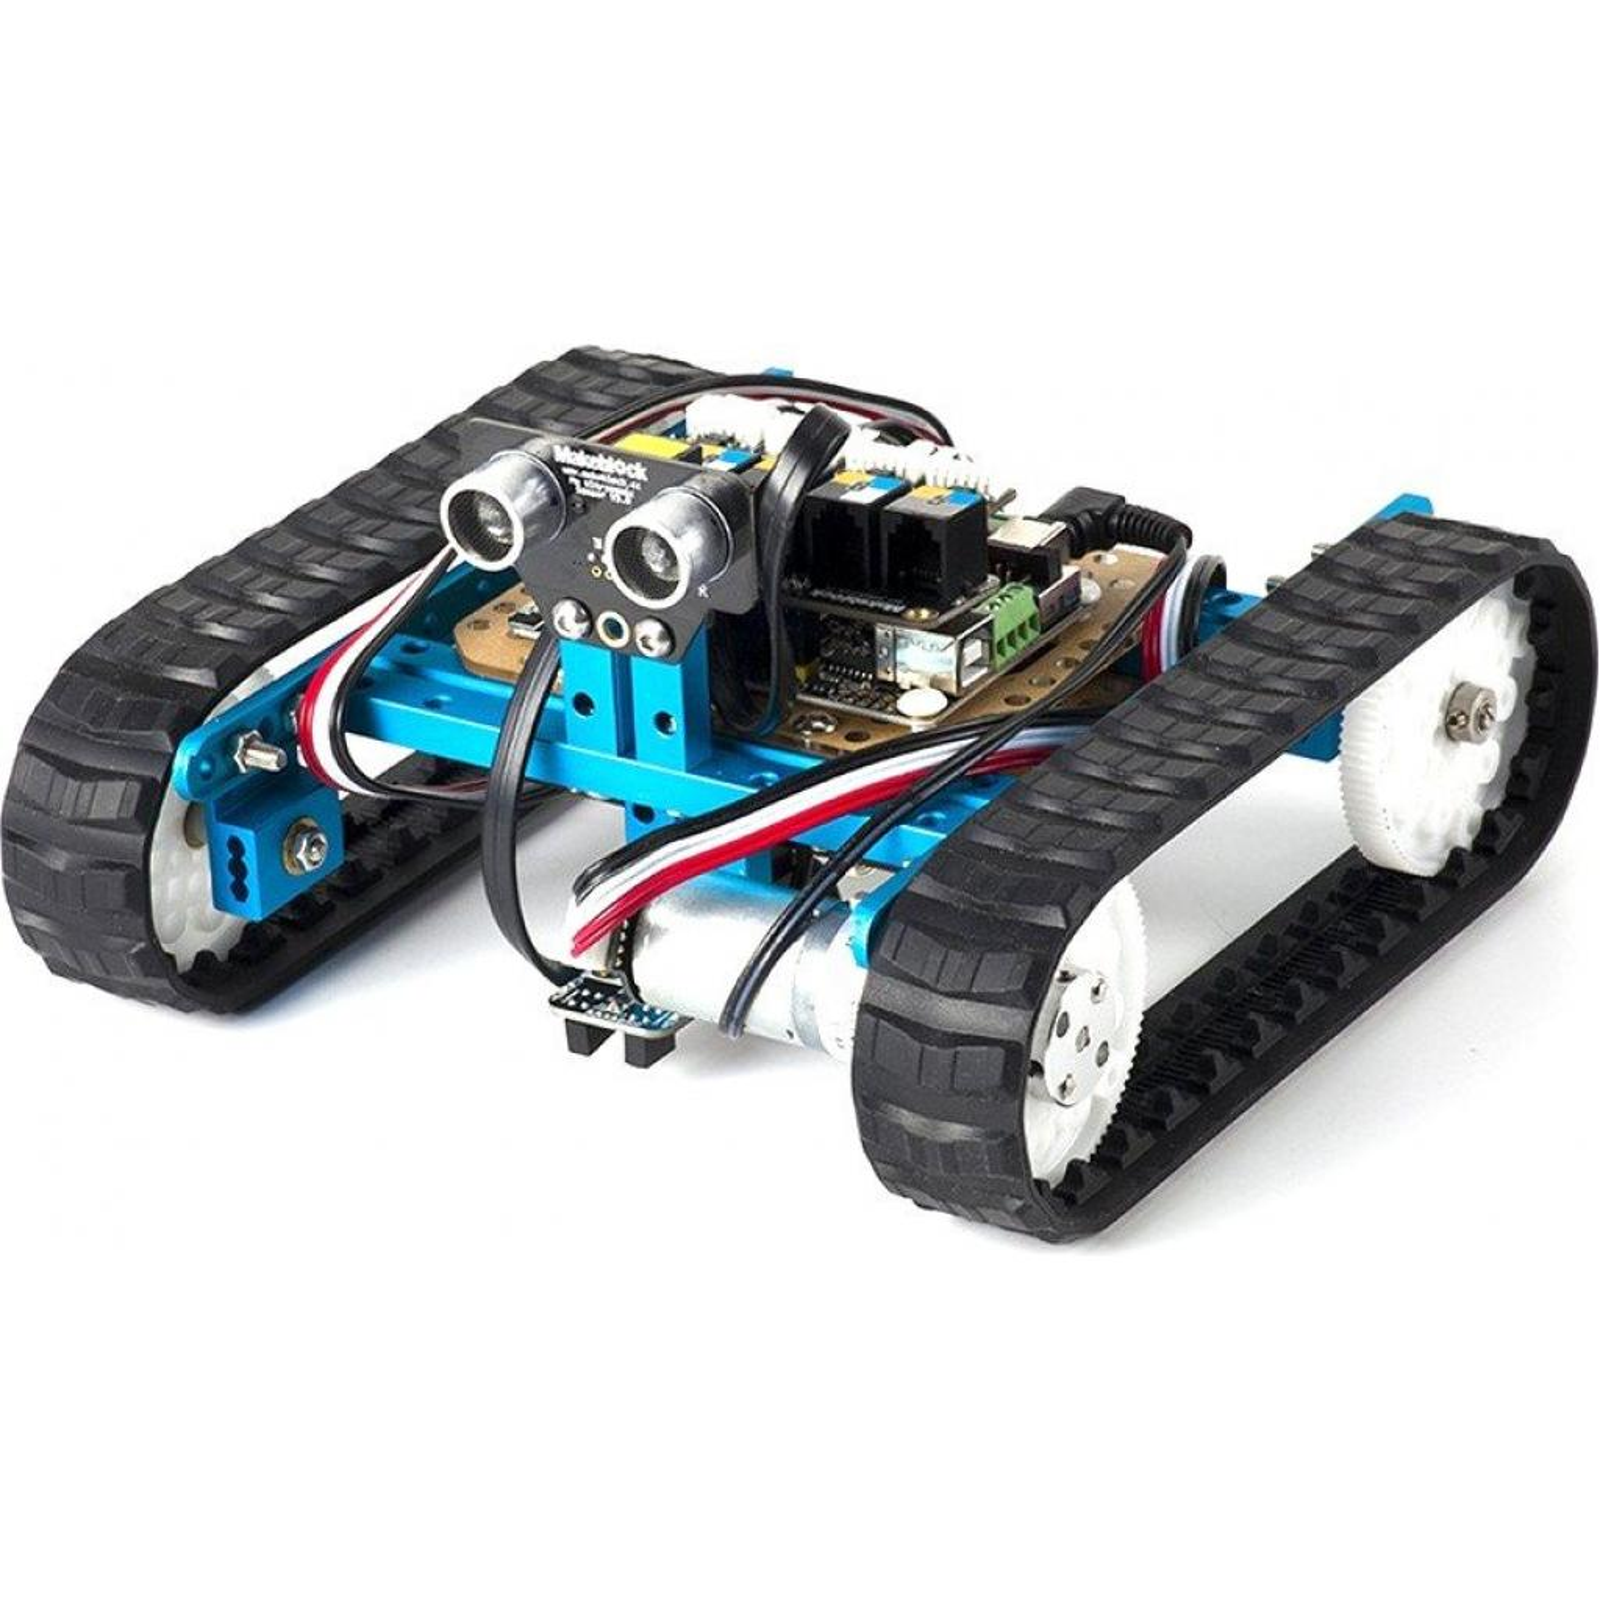 Робот Makeblock Ultimate v2.0 Robot Kit (09.00.40) изображение 3